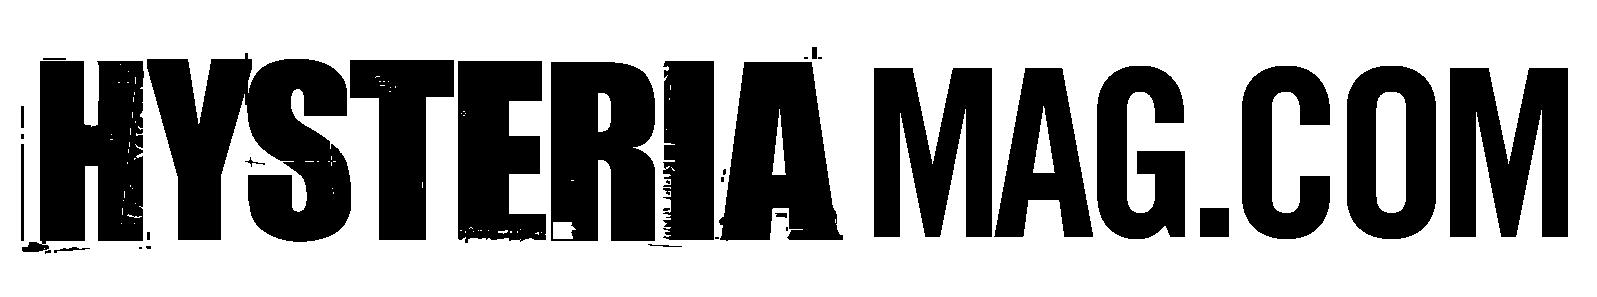 The Amity Affliction Logo Transparent